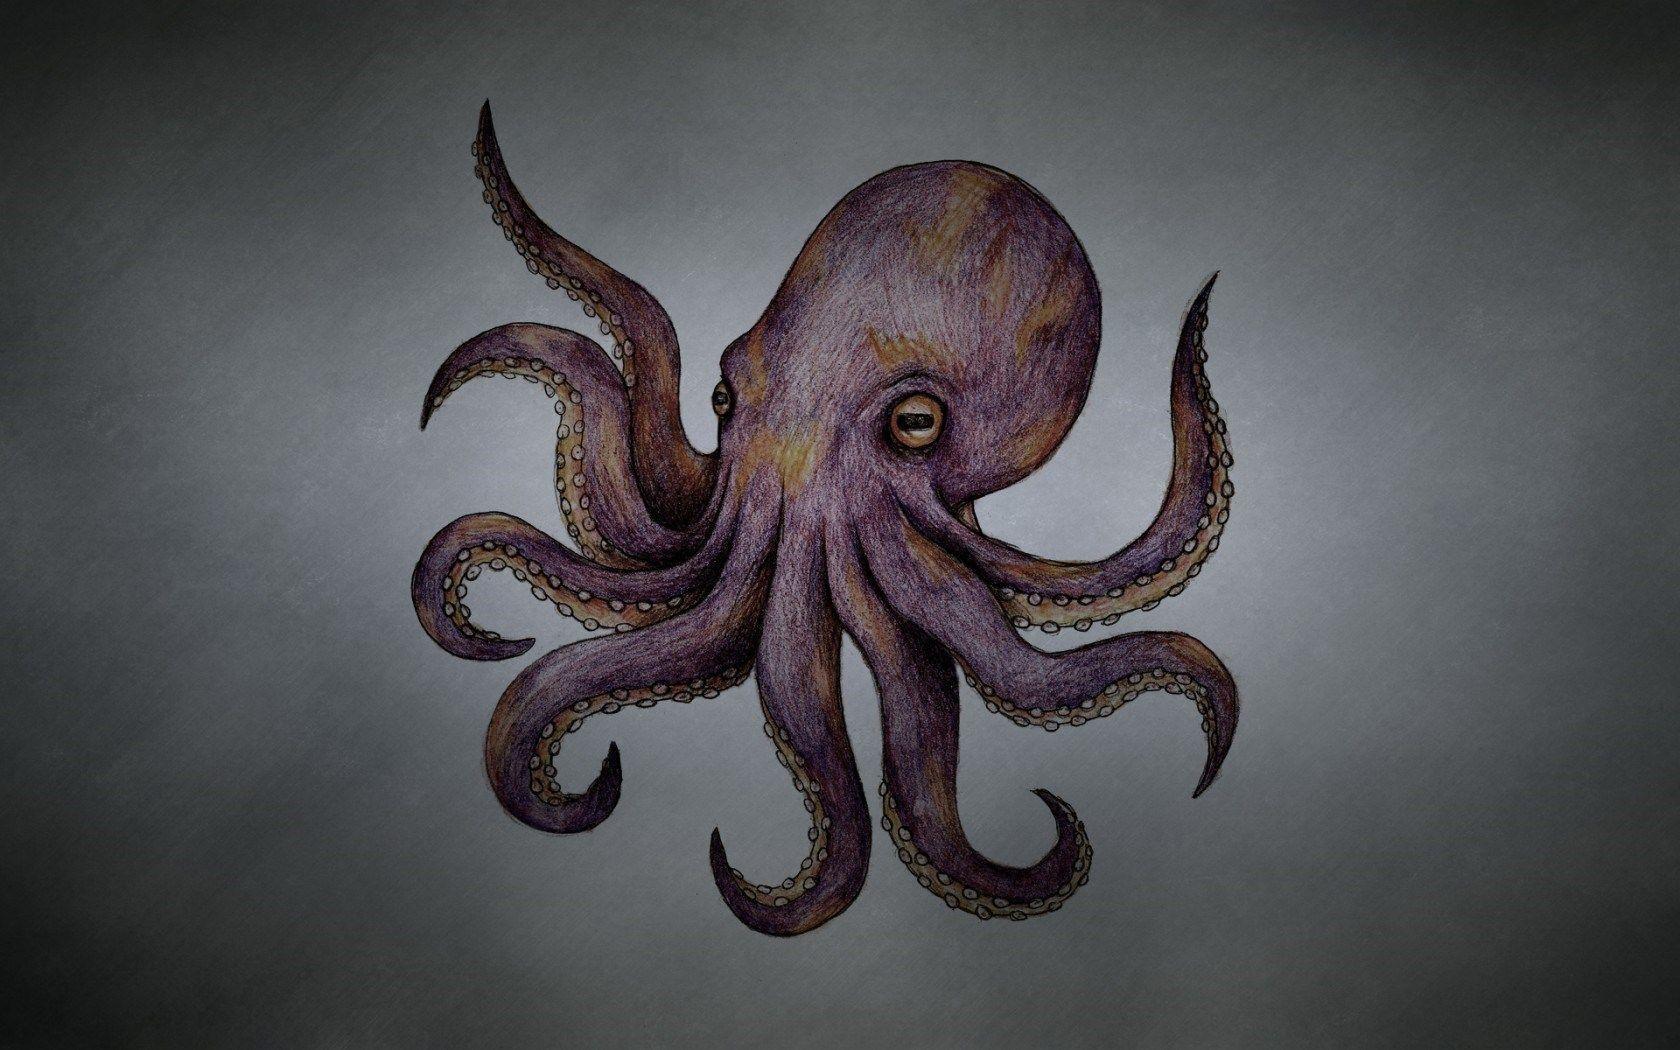 Octopus art wallpaper